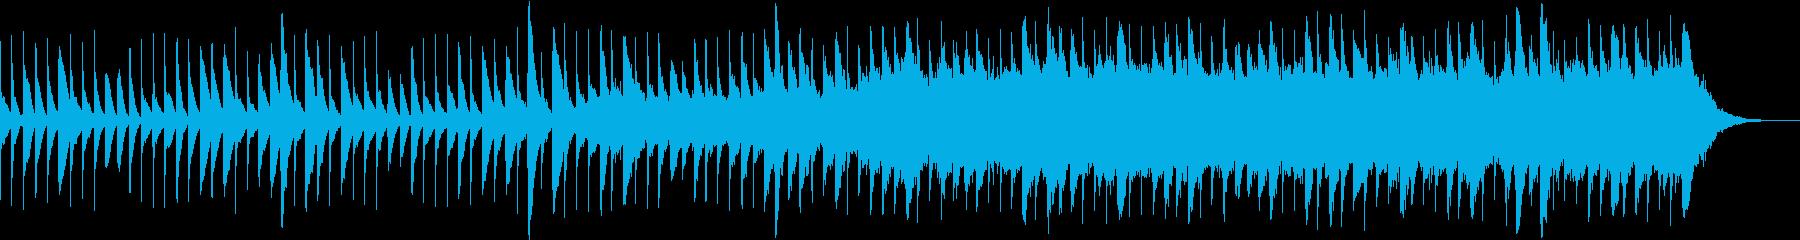 Cool Atmosphereの再生済みの波形